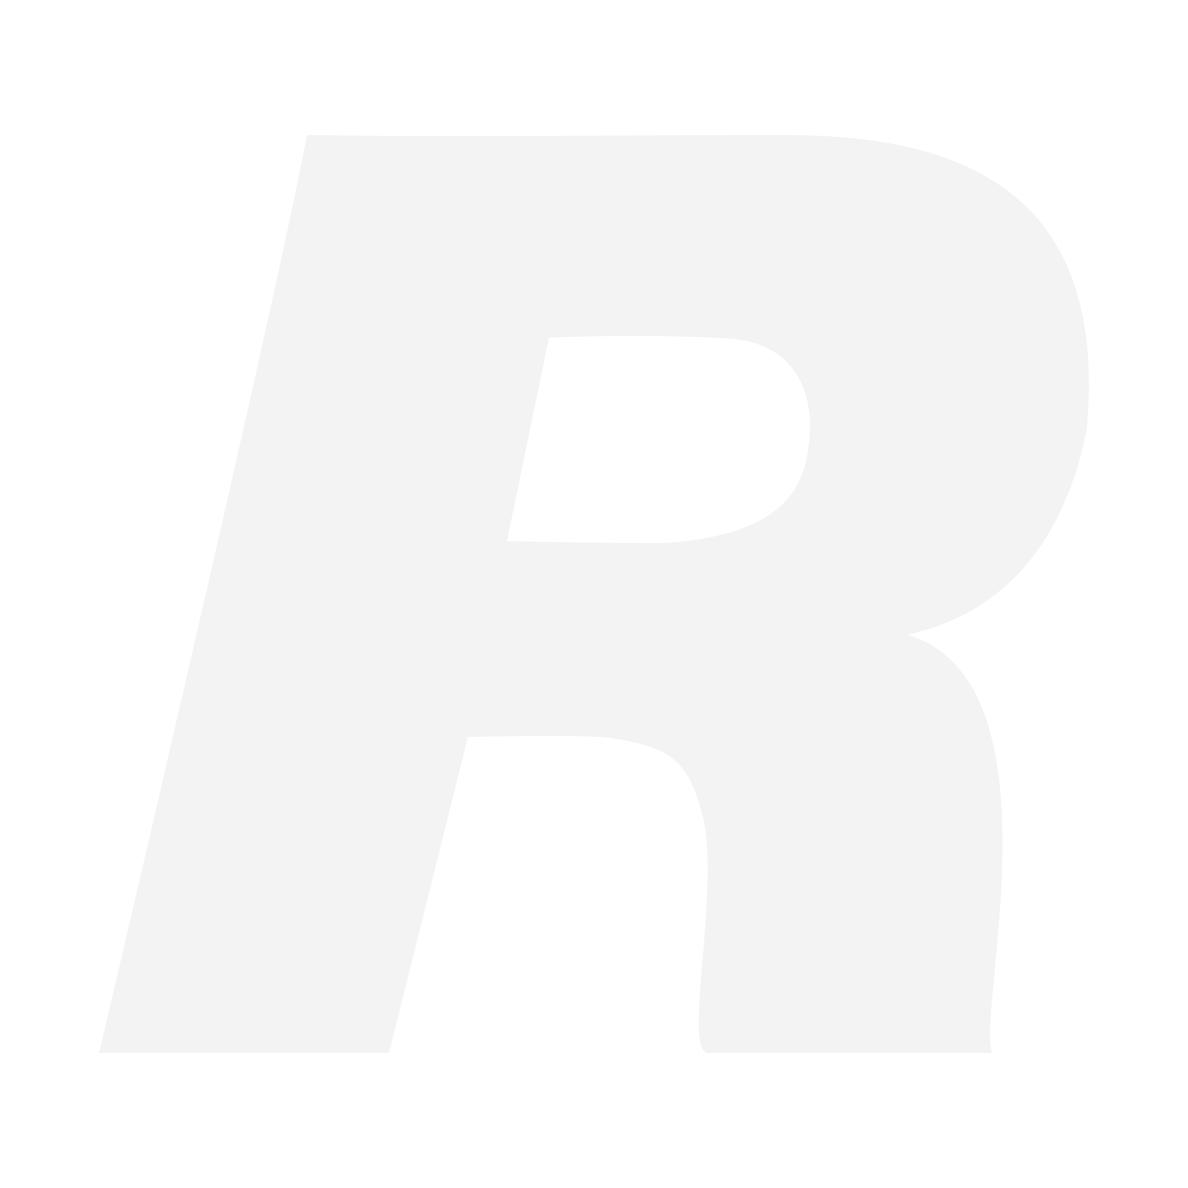 Zeiss Touit 50/2.8 Macro, Sony E